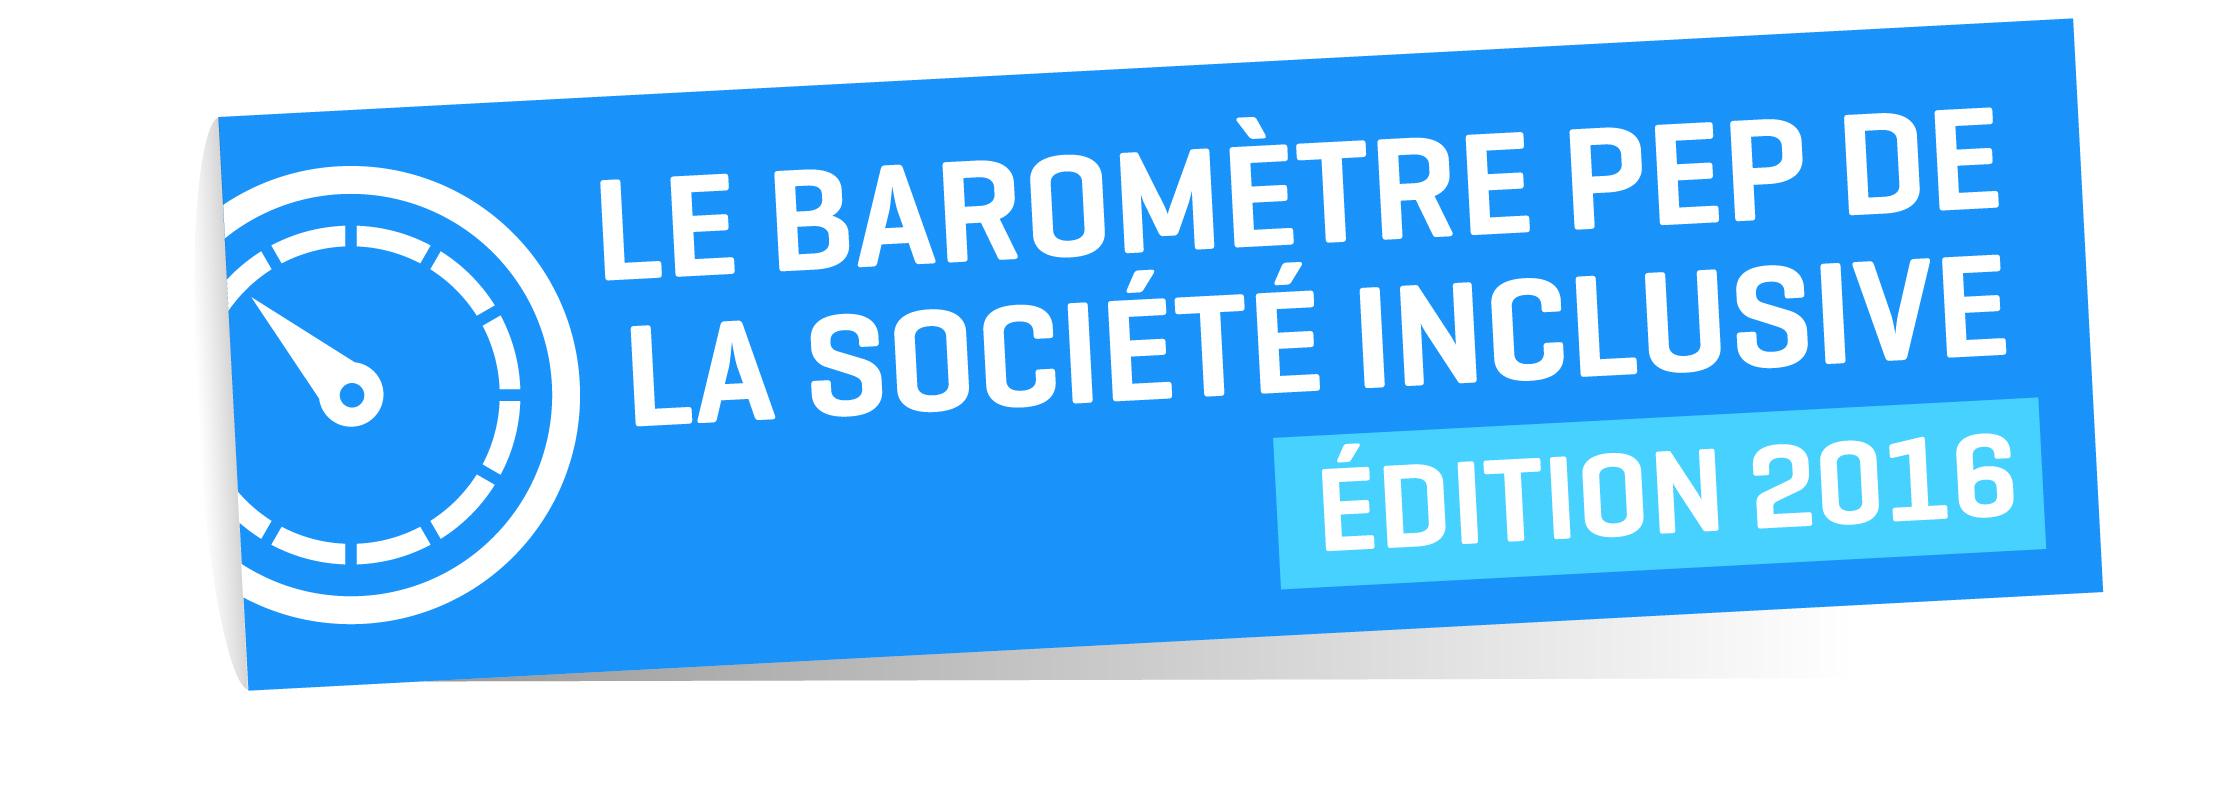 LOGO_BAROMETRE